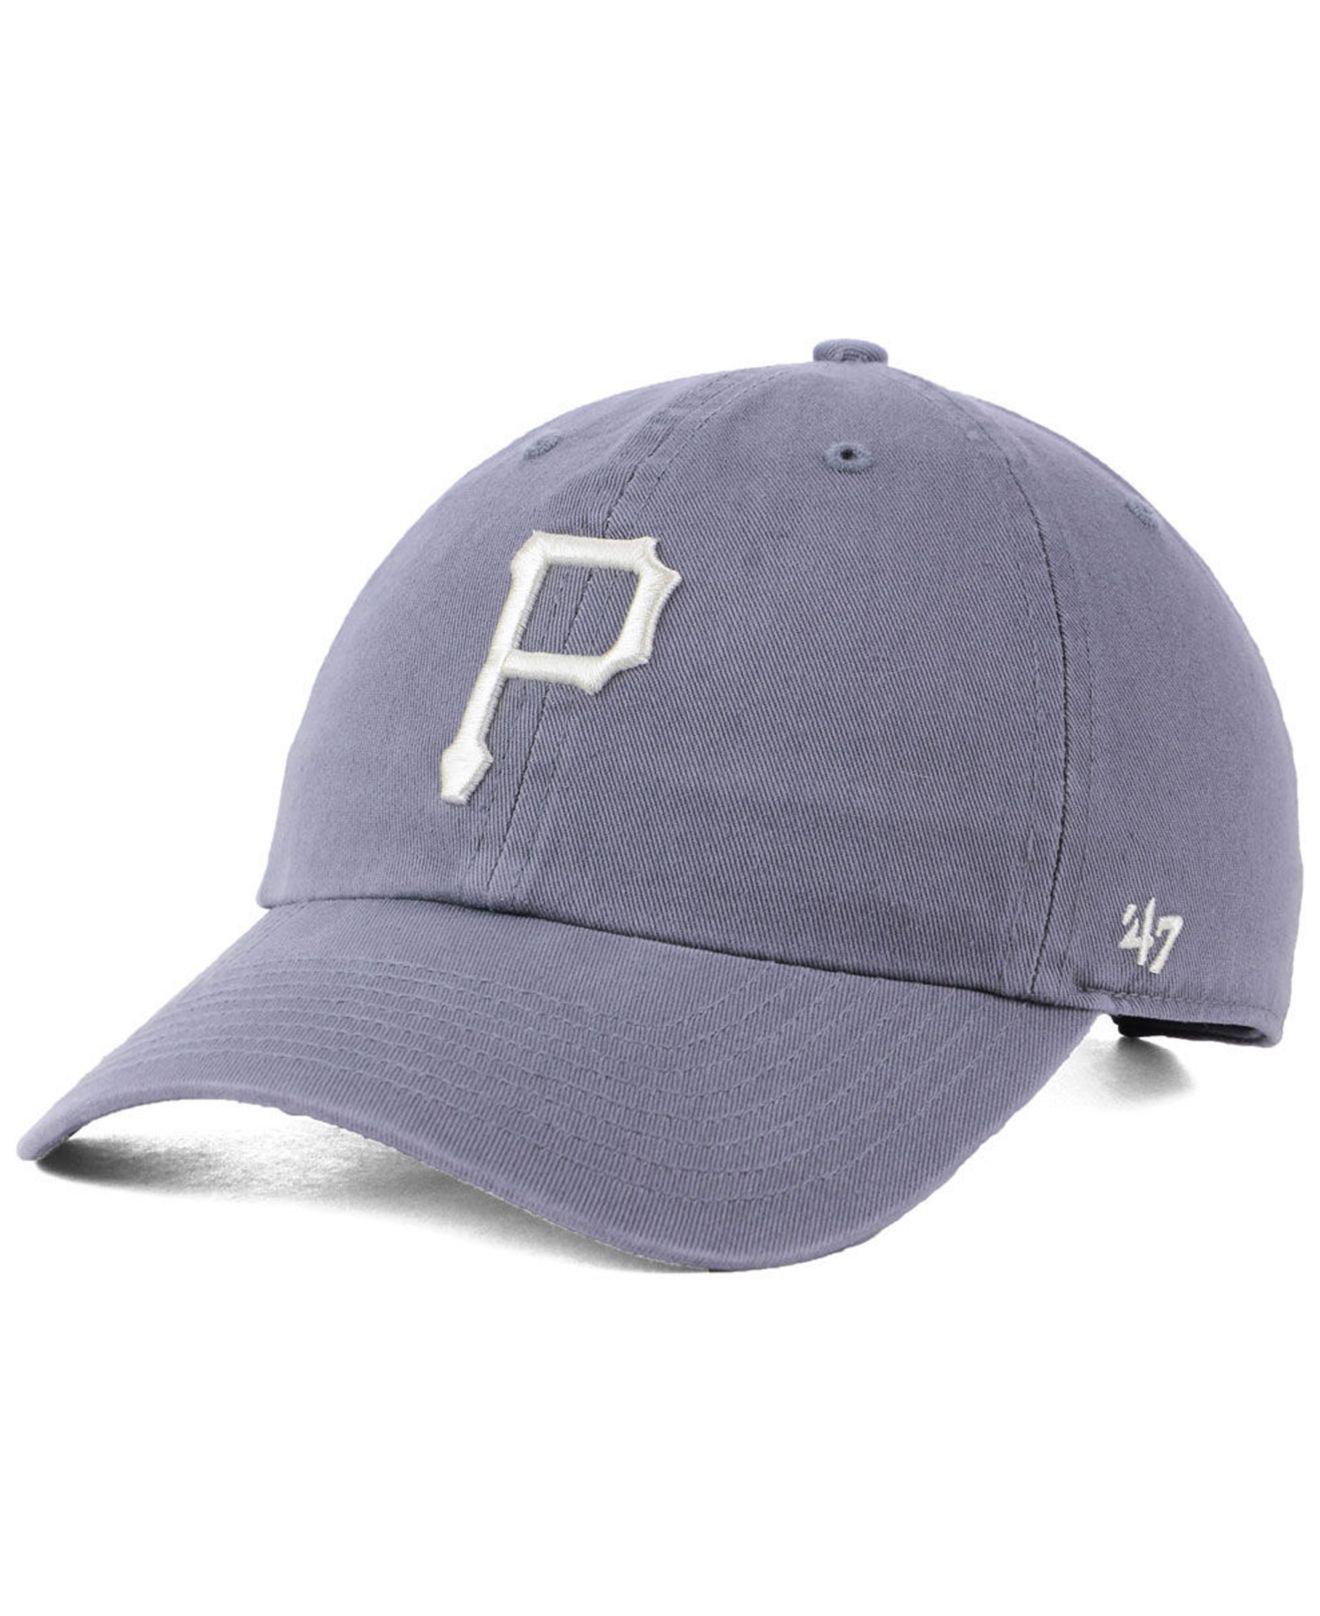 premium selection a6e72 52c6f ... sweden 47 brand. mens pittsburgh pirates dark gray clean up cap 161bf  f1310